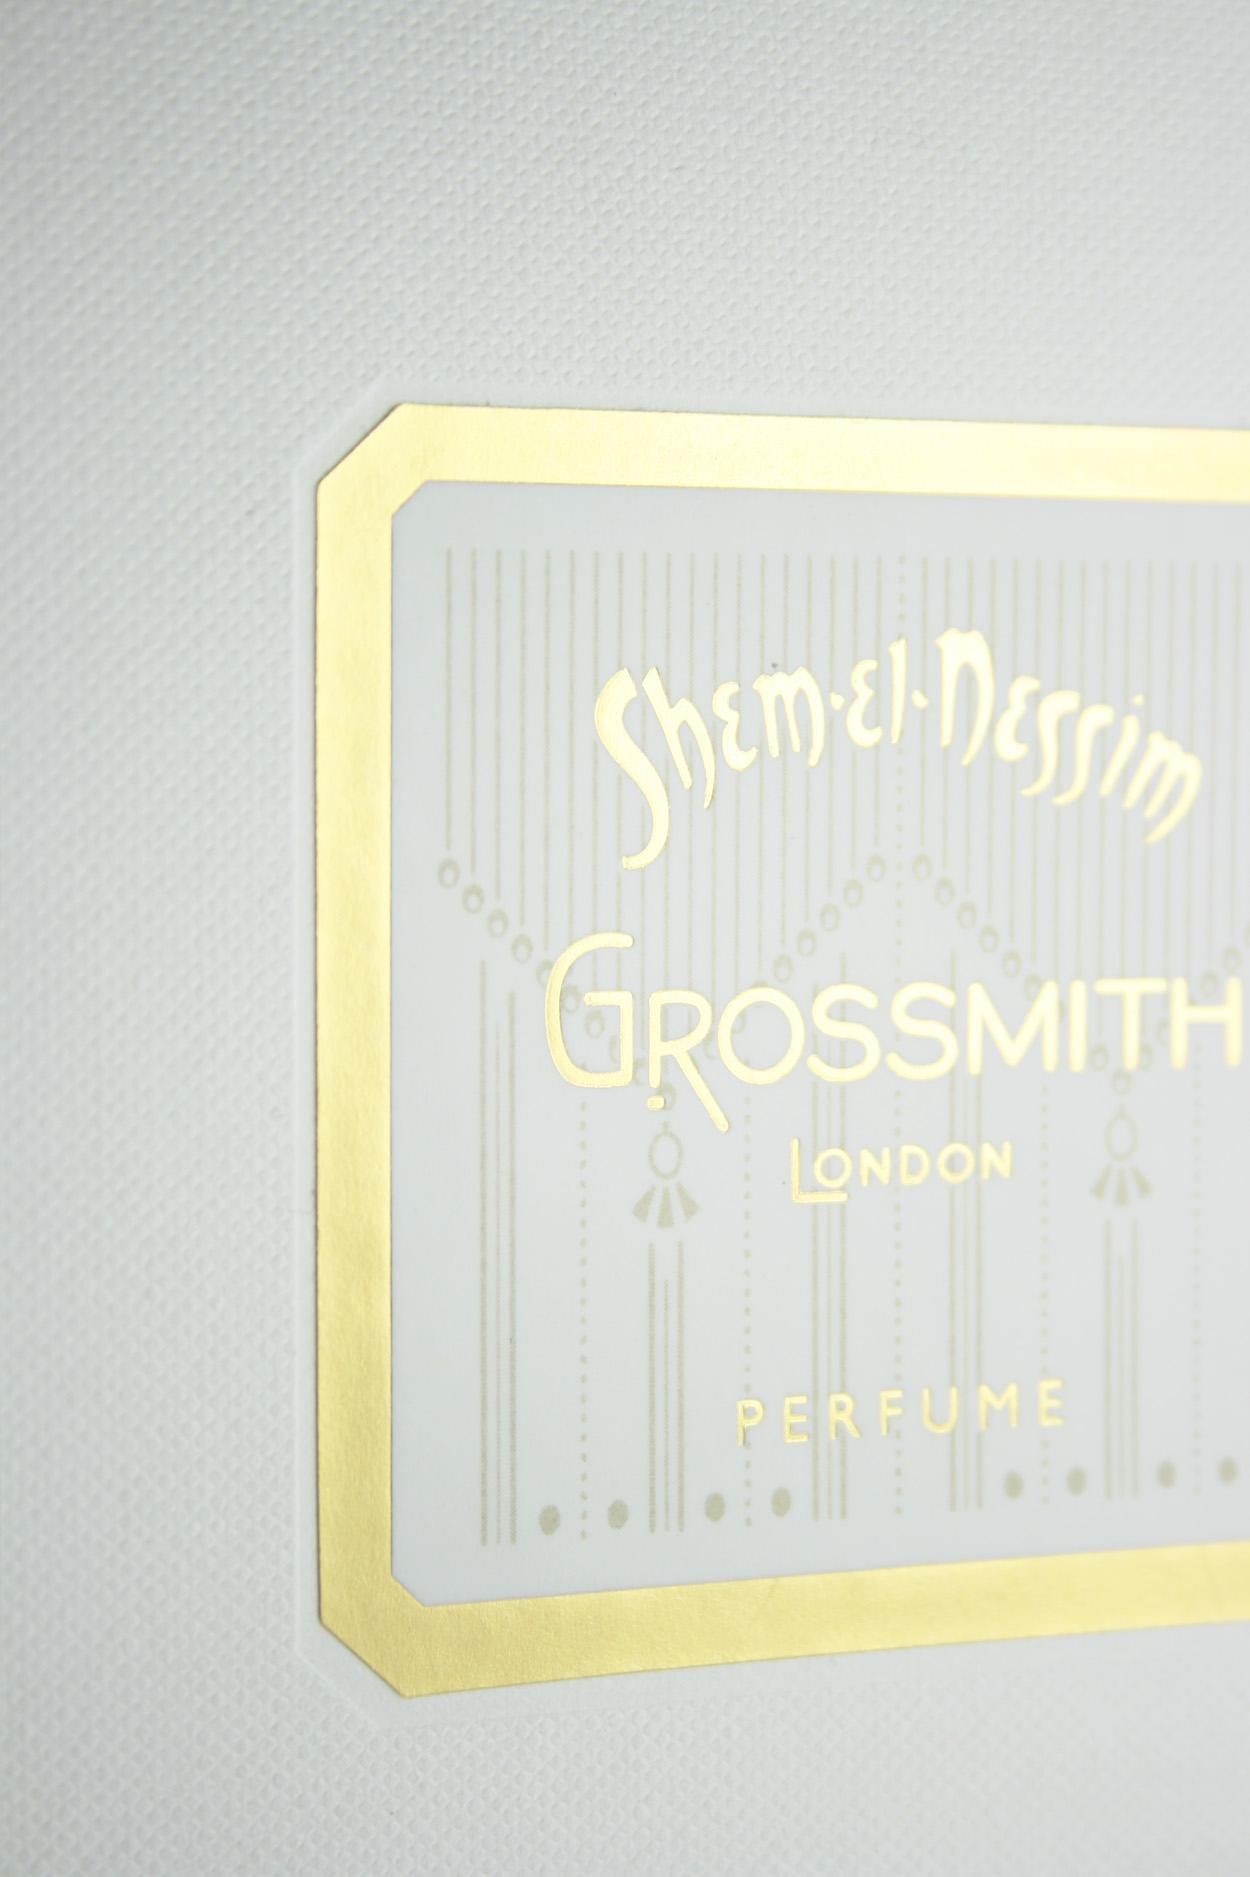 Grossmith_Shem-el-Nessim_Perfume label.jpg